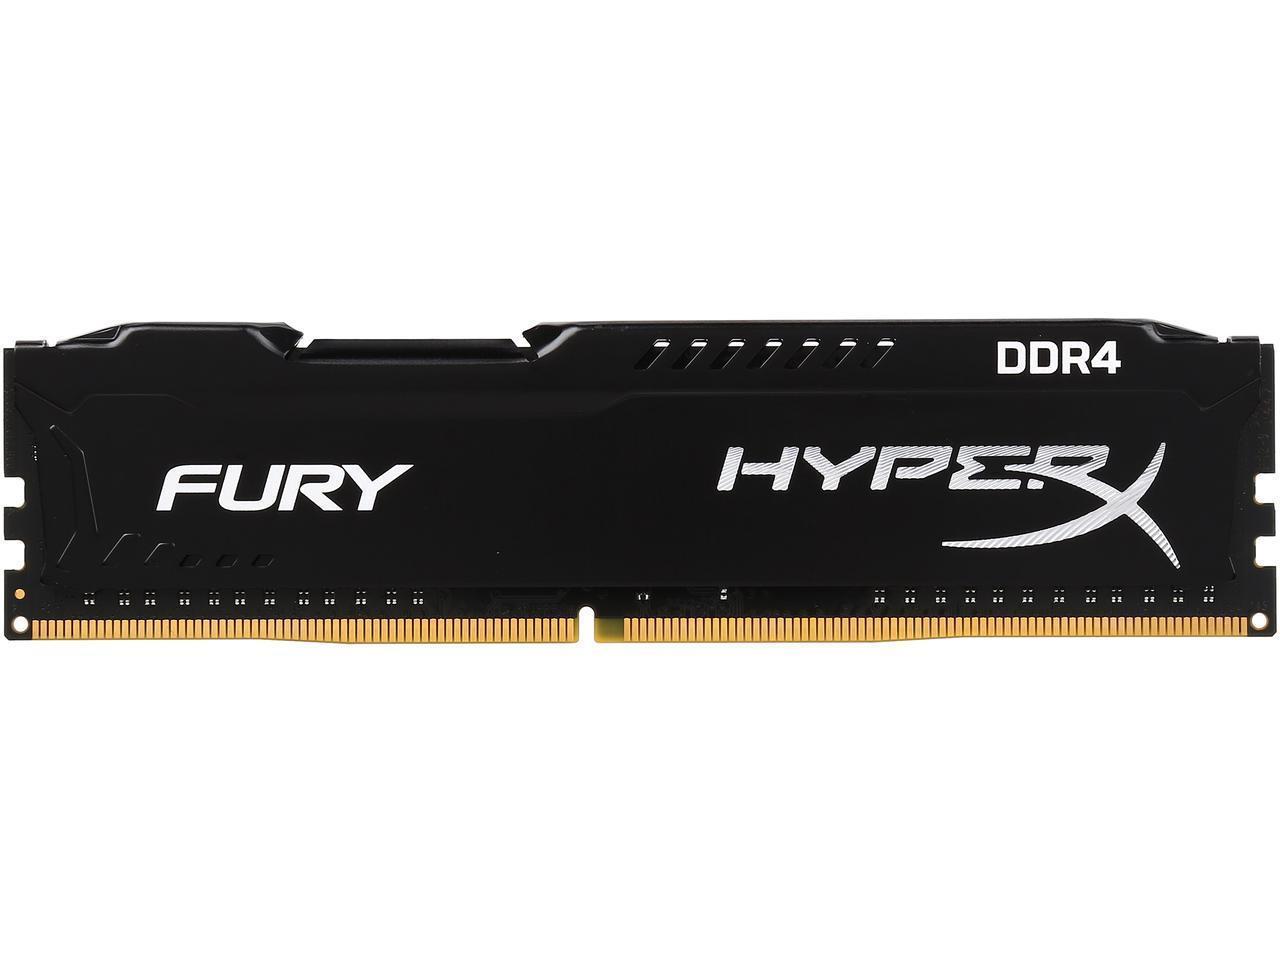 Памет Kingston HyperX Fury 4GB DDR4 PC4-21300 2666Mhz CL15 HX426C15FB/4